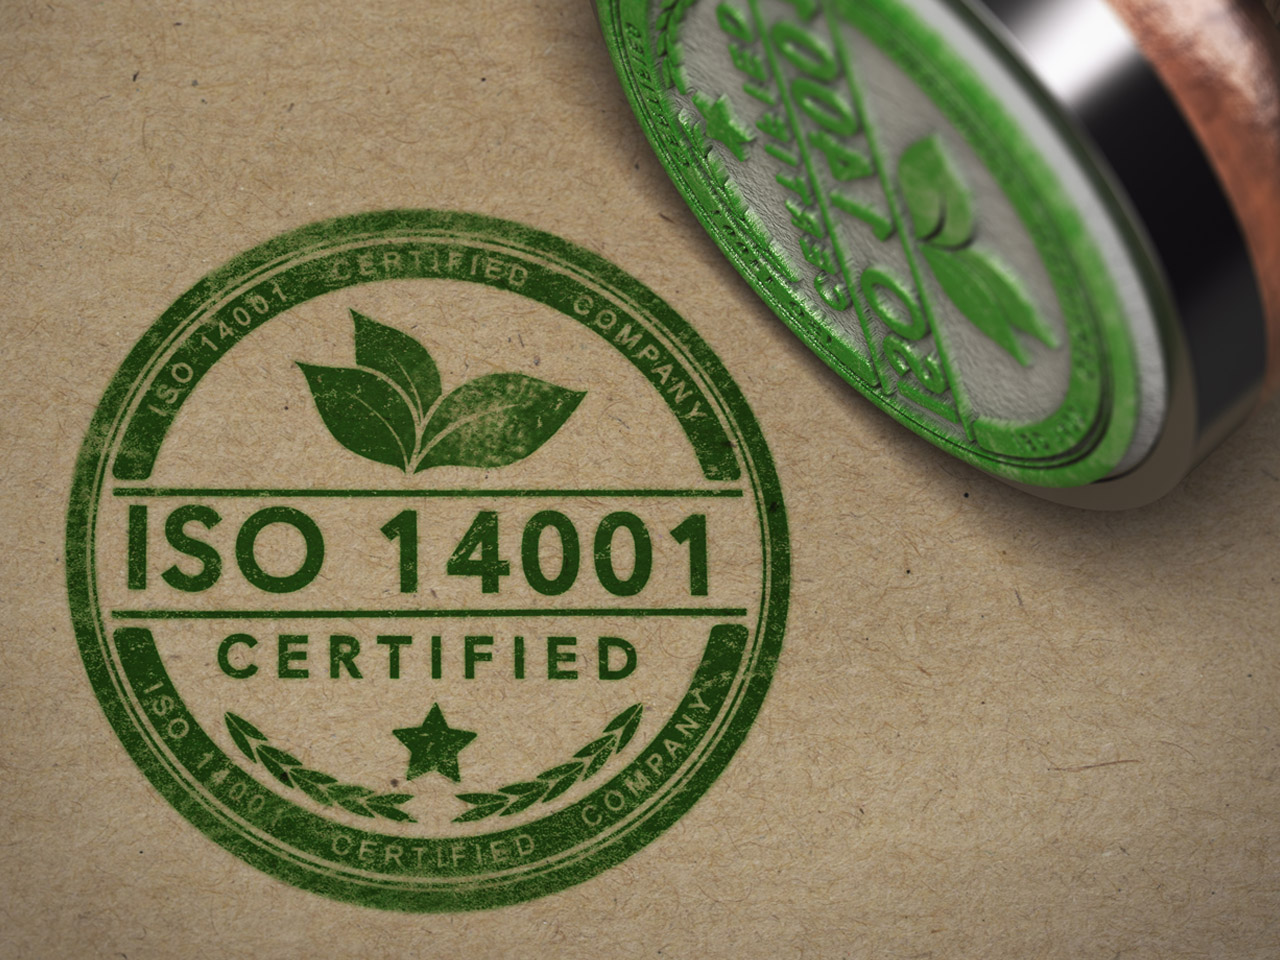 Aplicaciones Tecnológicas adapte et renouvelle la certification de son système de management environnemental ISO 14001